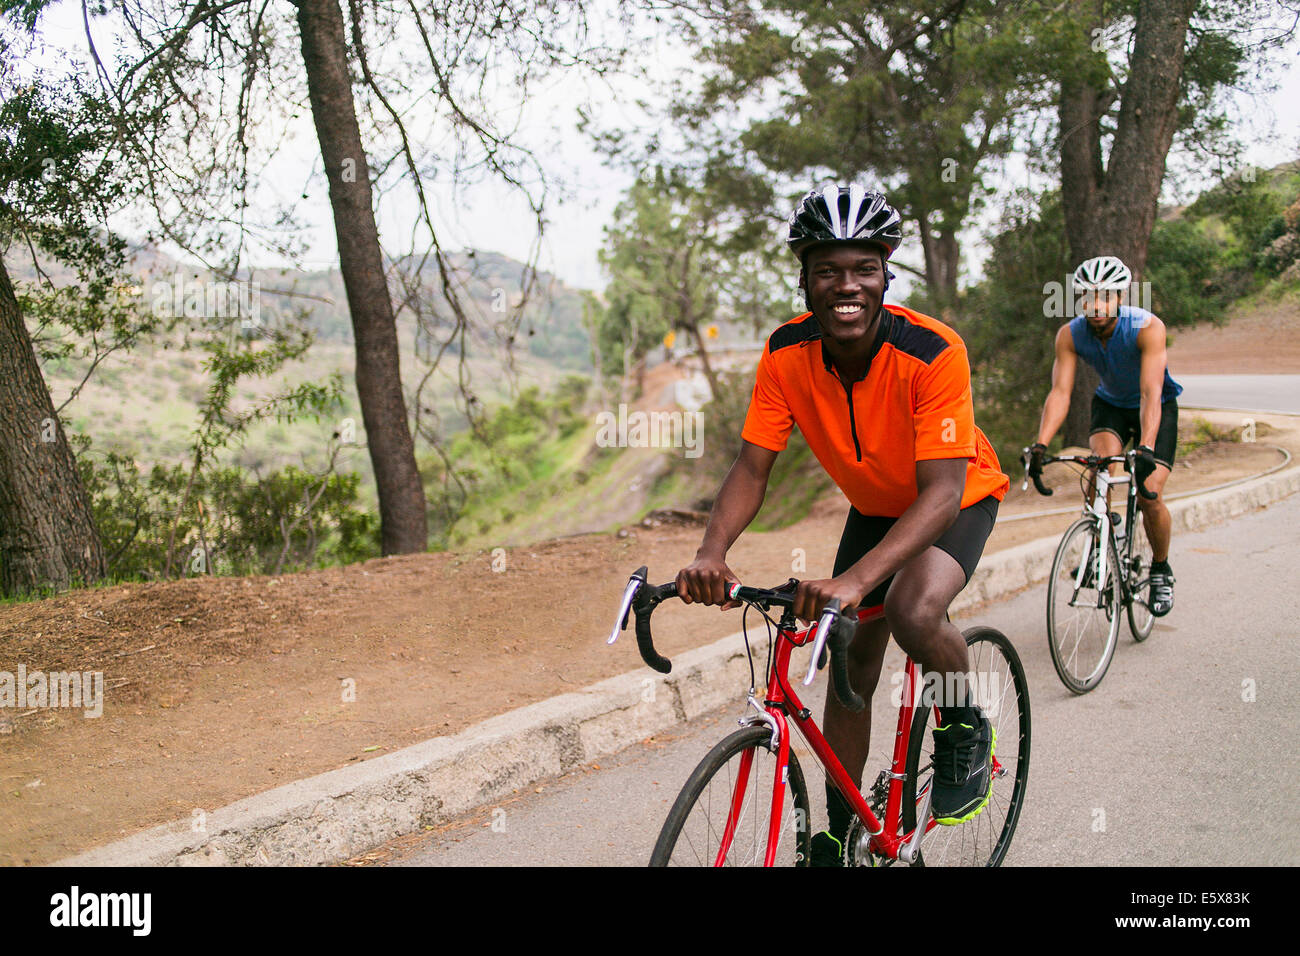 Radfahrer bergauf unterwegs Stockbild